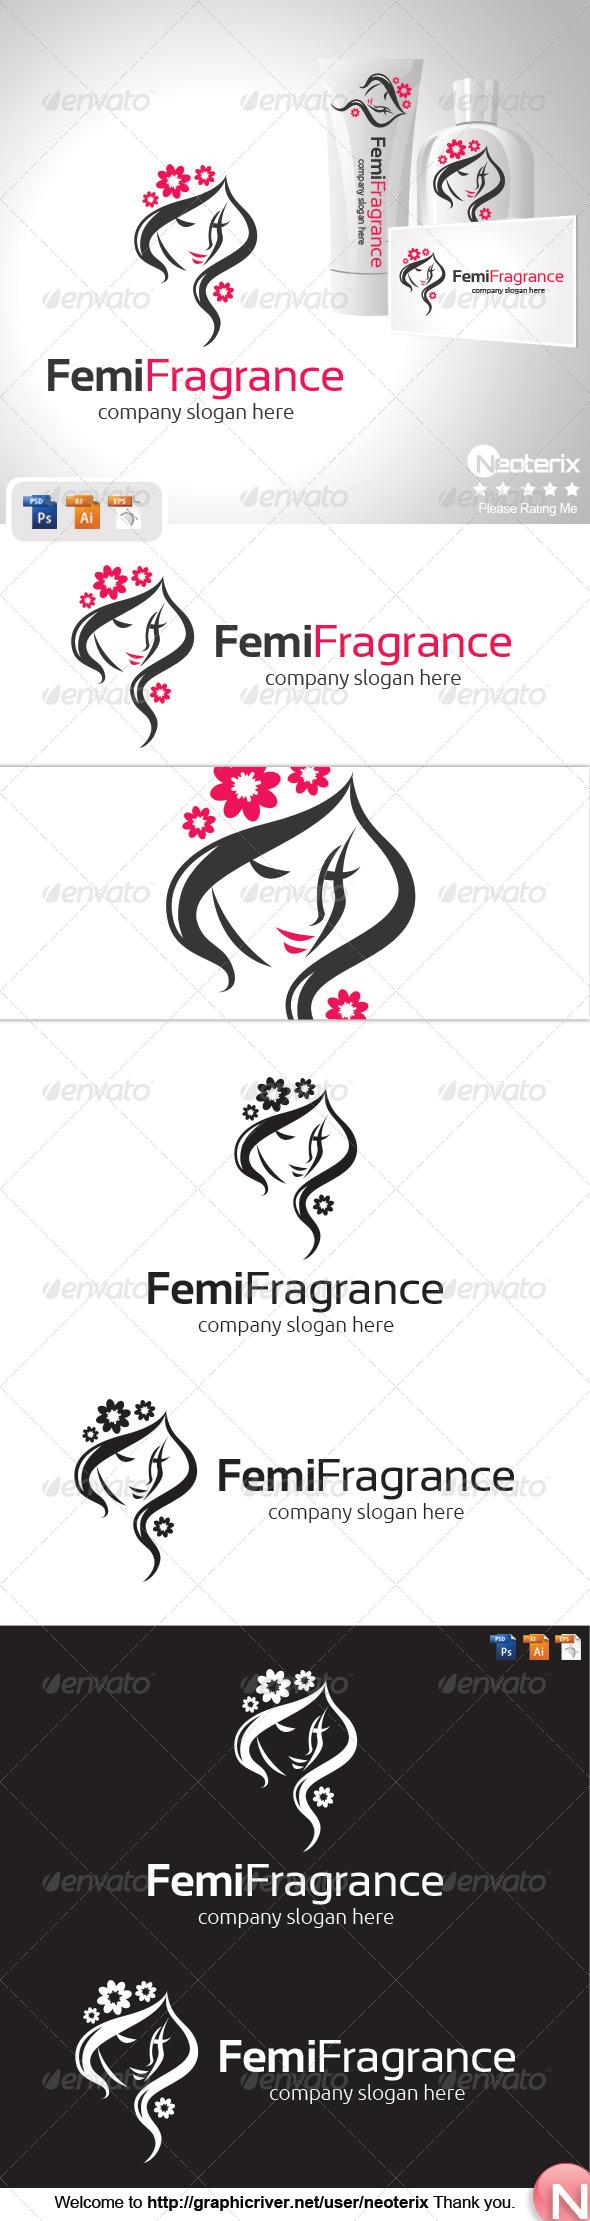 GraphicRiver Feminine Fragrance 8317496